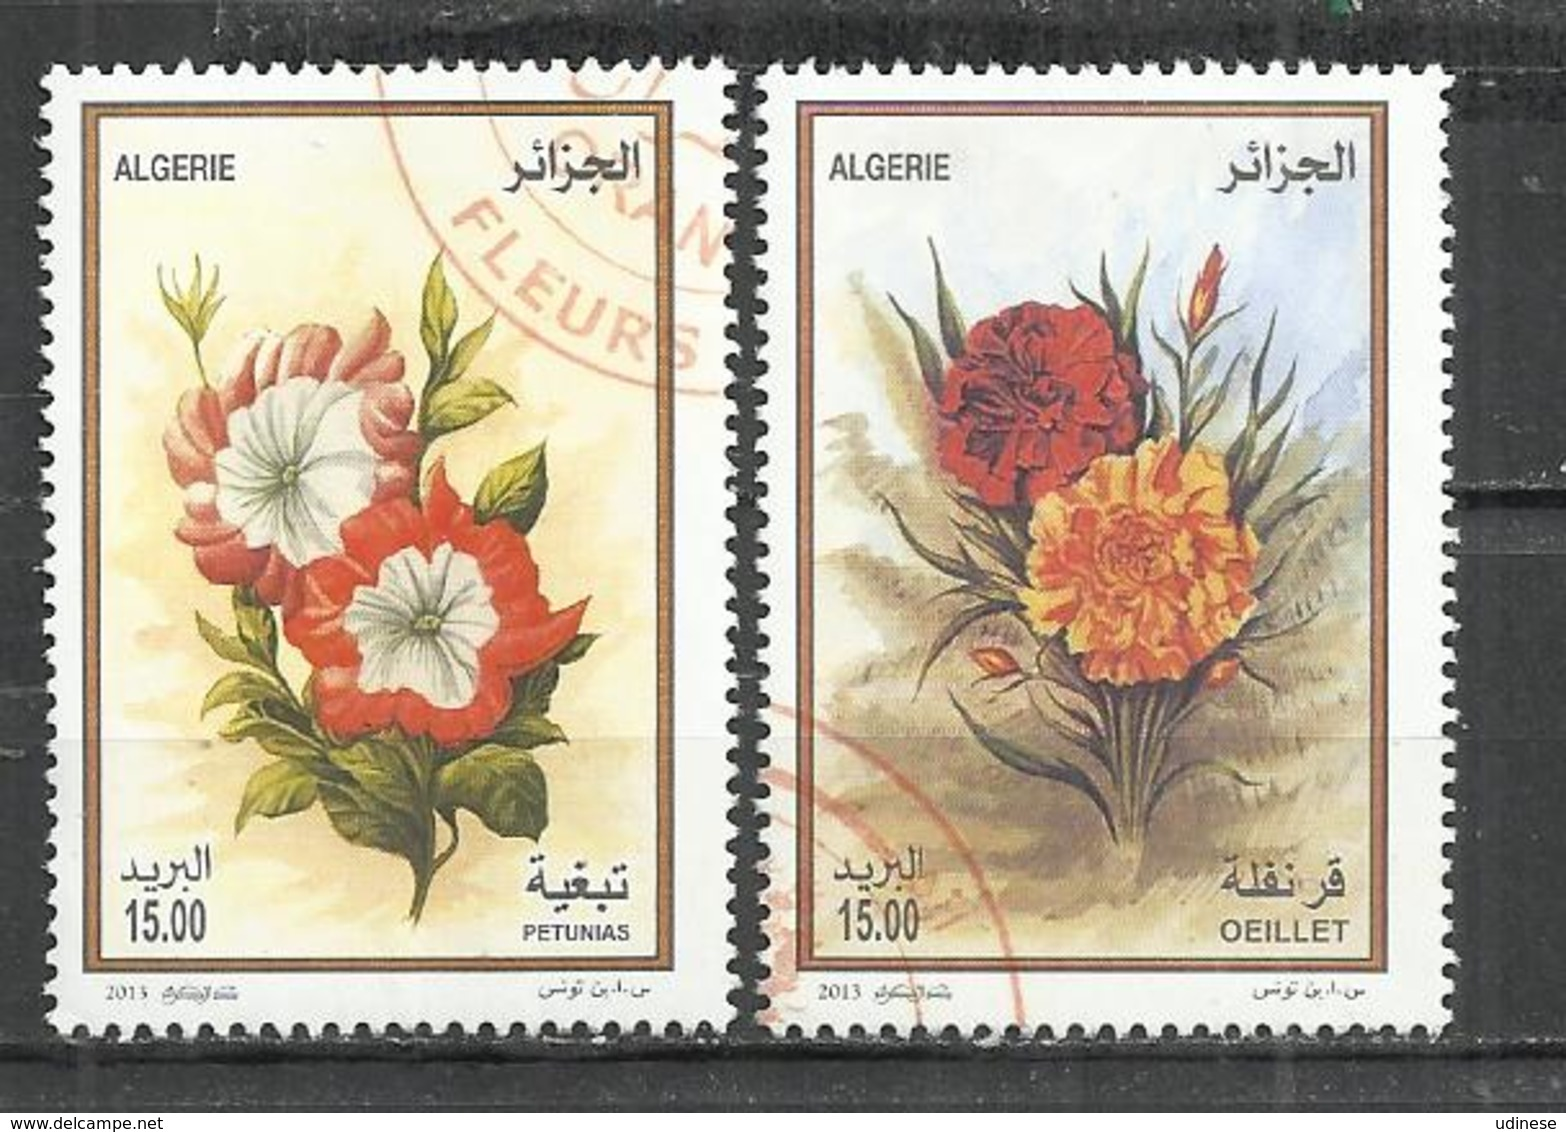 ALGERIA 2013 - FLOWERS - CPL. SET - OBLITERE USED GESTEMPELT USADO - Végétaux